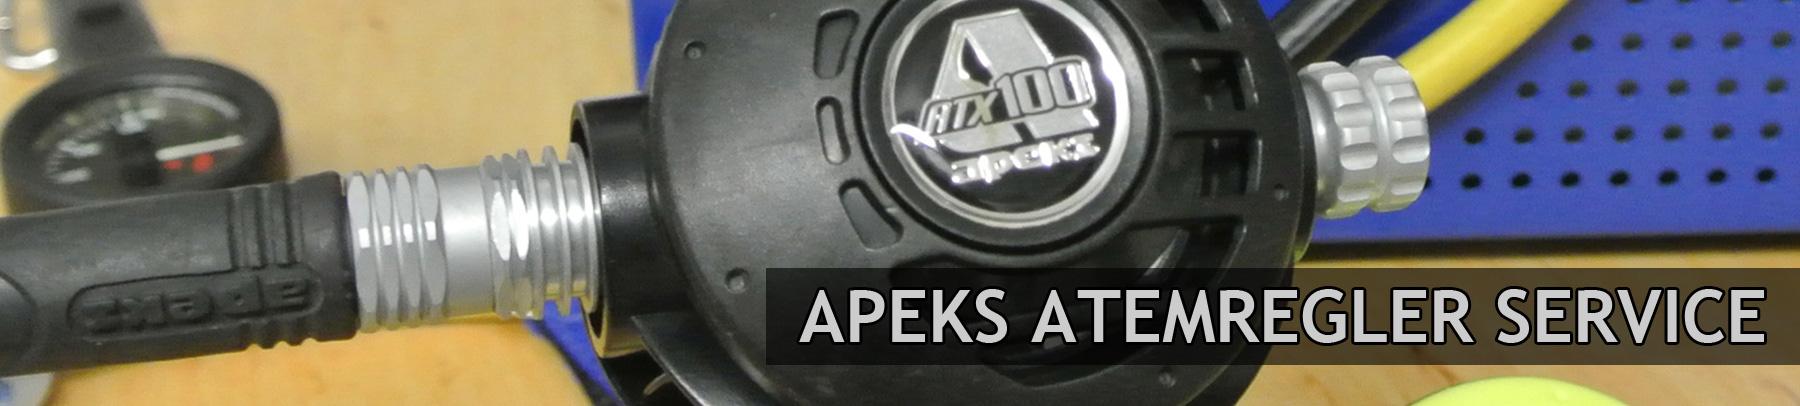 Apeks-Atemregler-Service-Banner-Detailseite